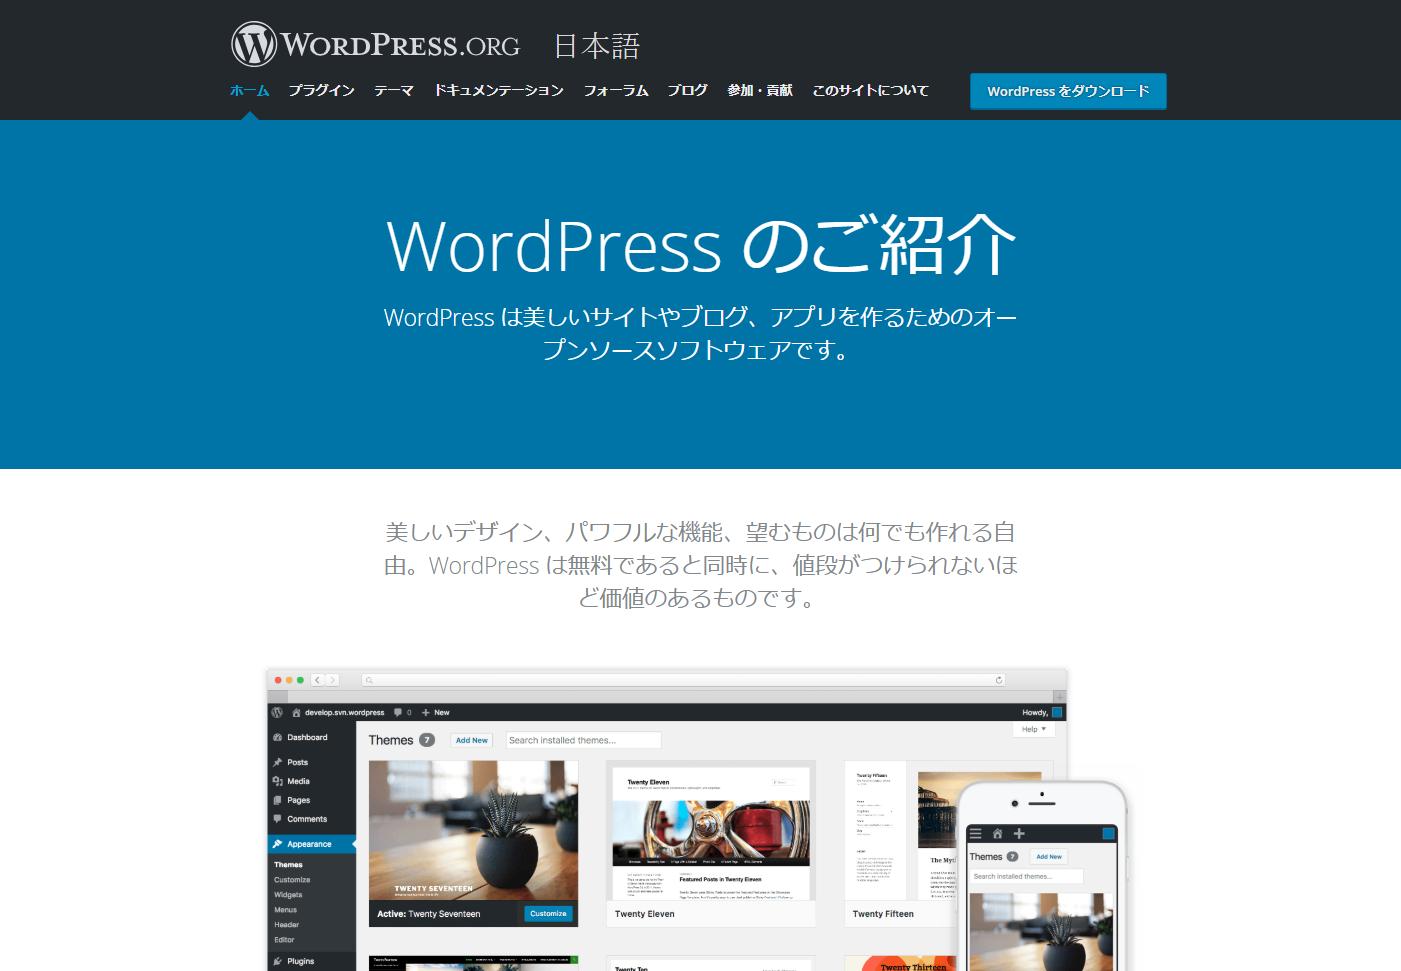 FireShot Capture 5 - 日本語 — WordPress - https___ja.wordpress.org_.png